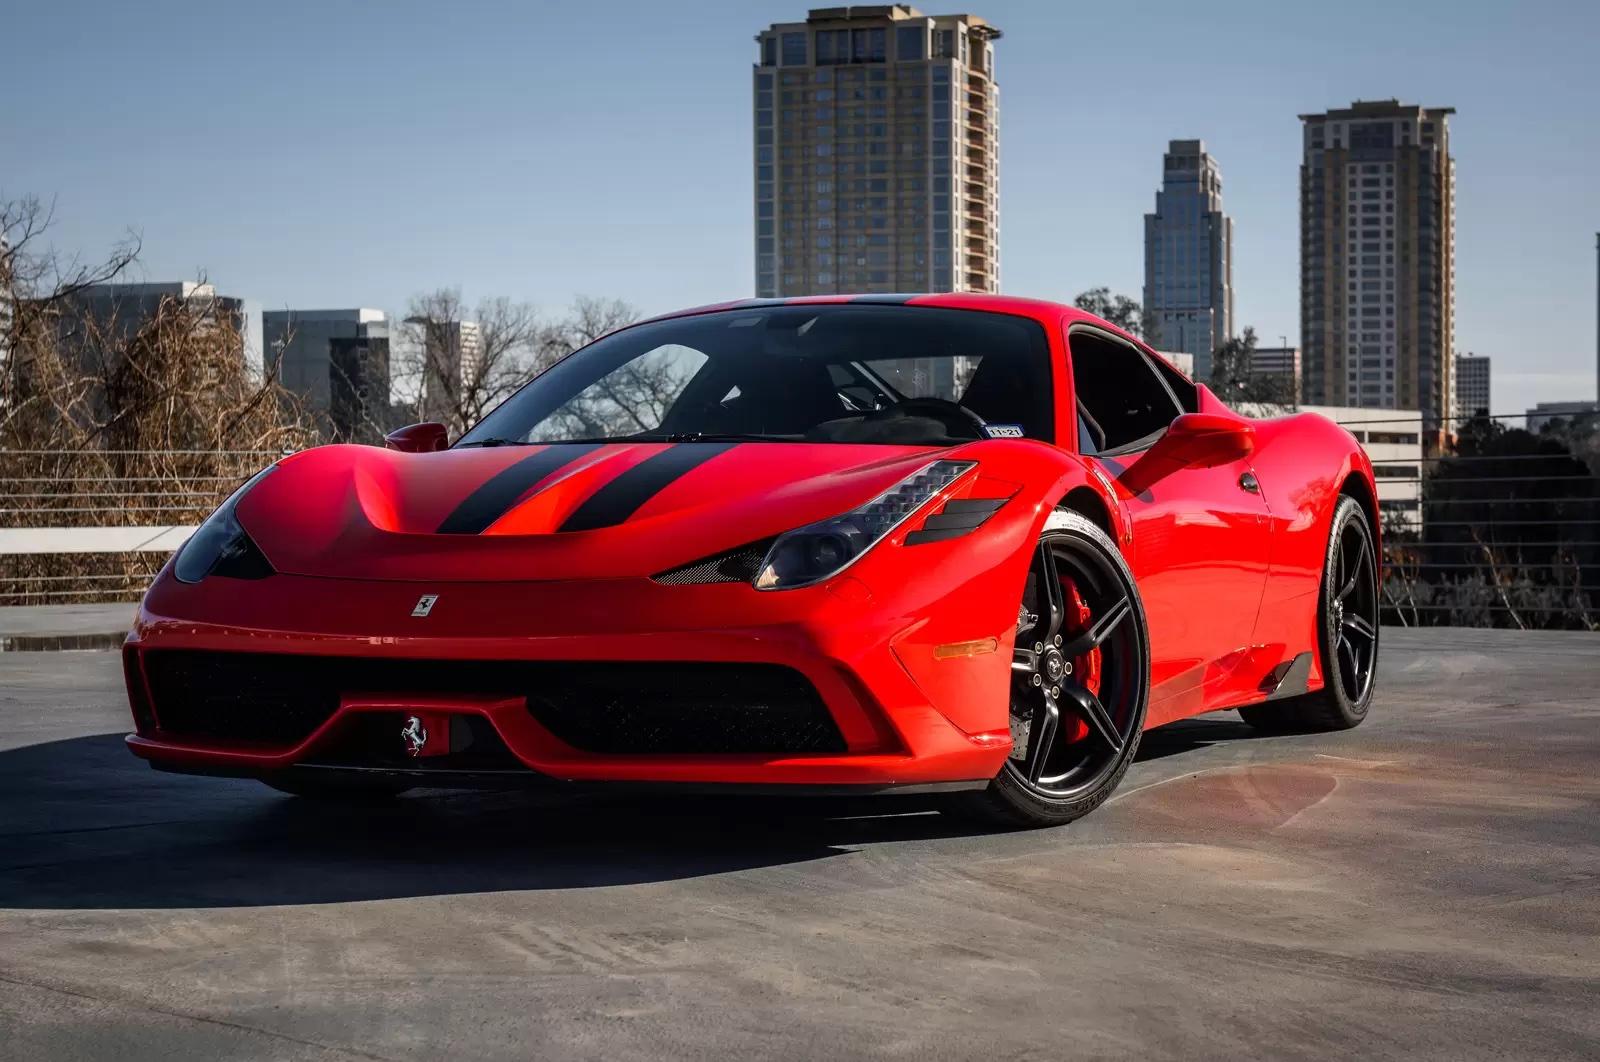 #180, New website thatsanicecar.com showcases exotic cars 2